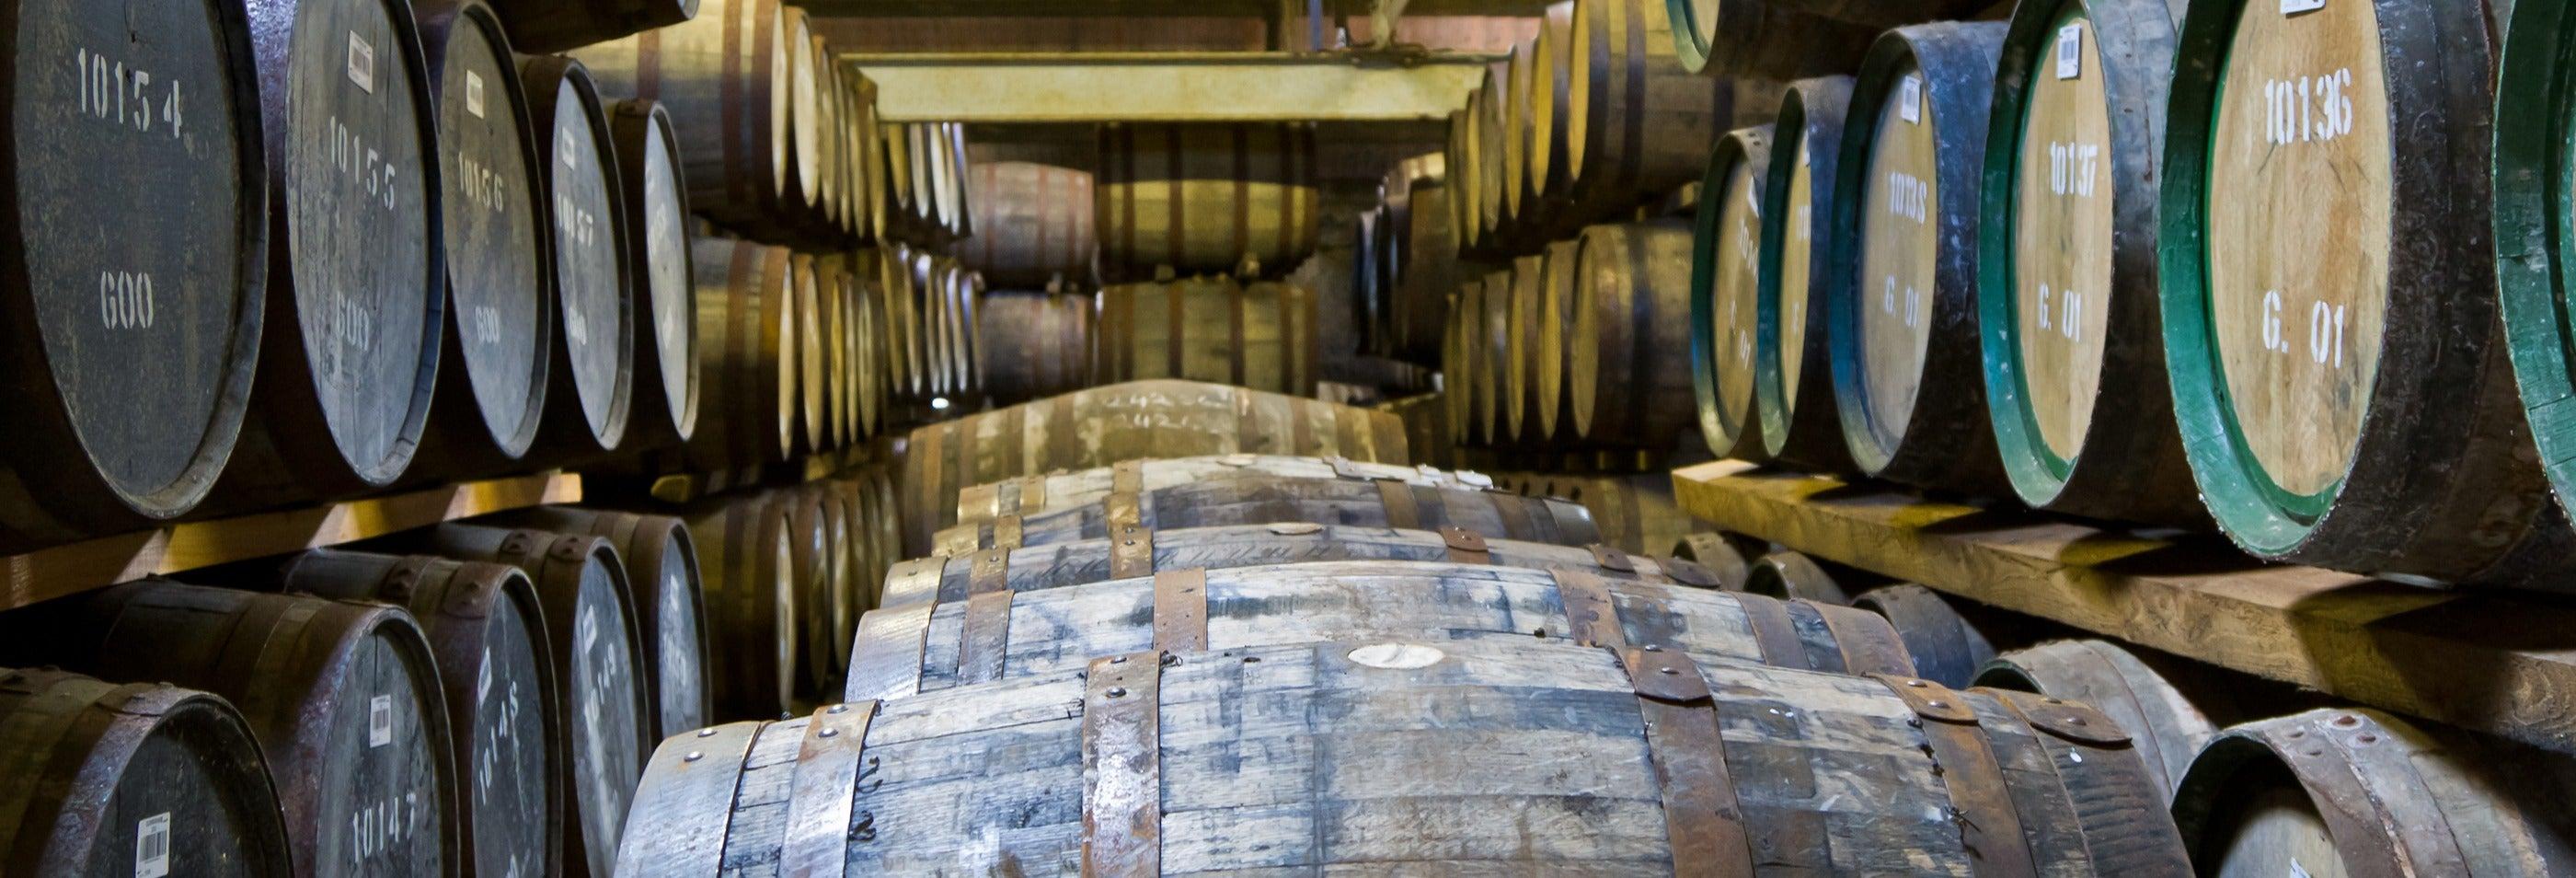 Excursion aux distilleries Dewar's et Deanston